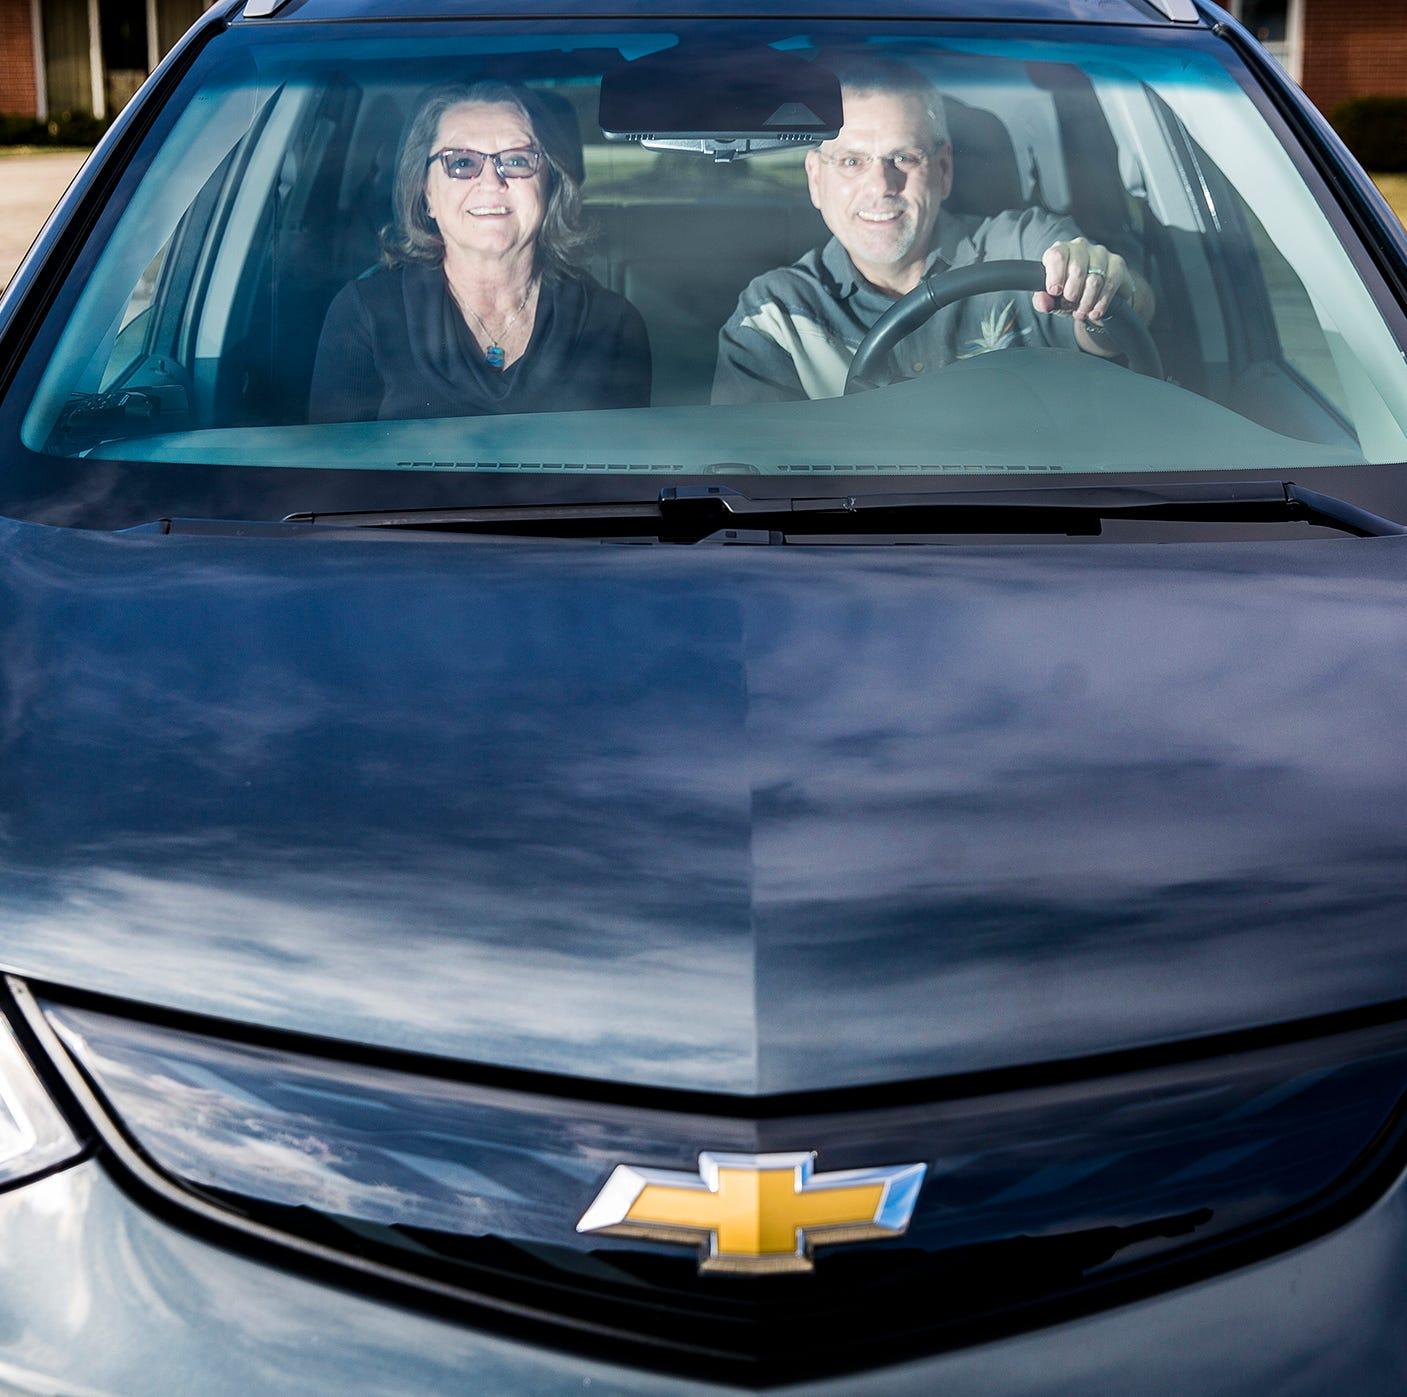 Car culture revolution spreading to Muncie